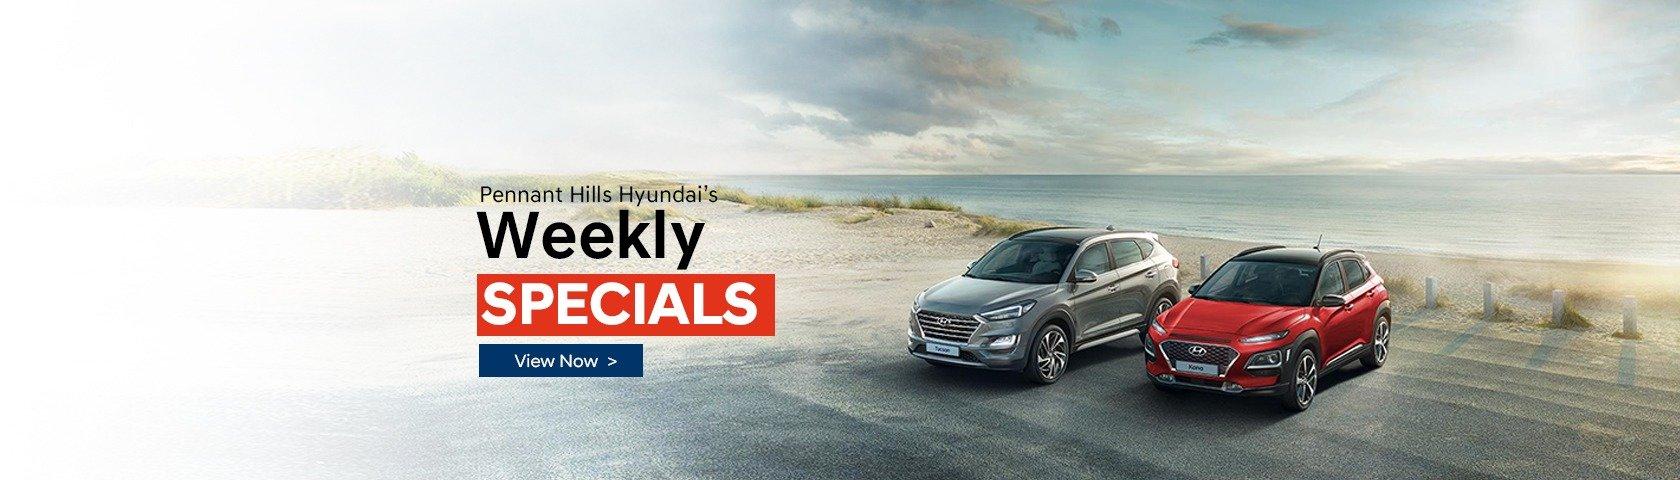 Pennant Hills Hyundai | Specials